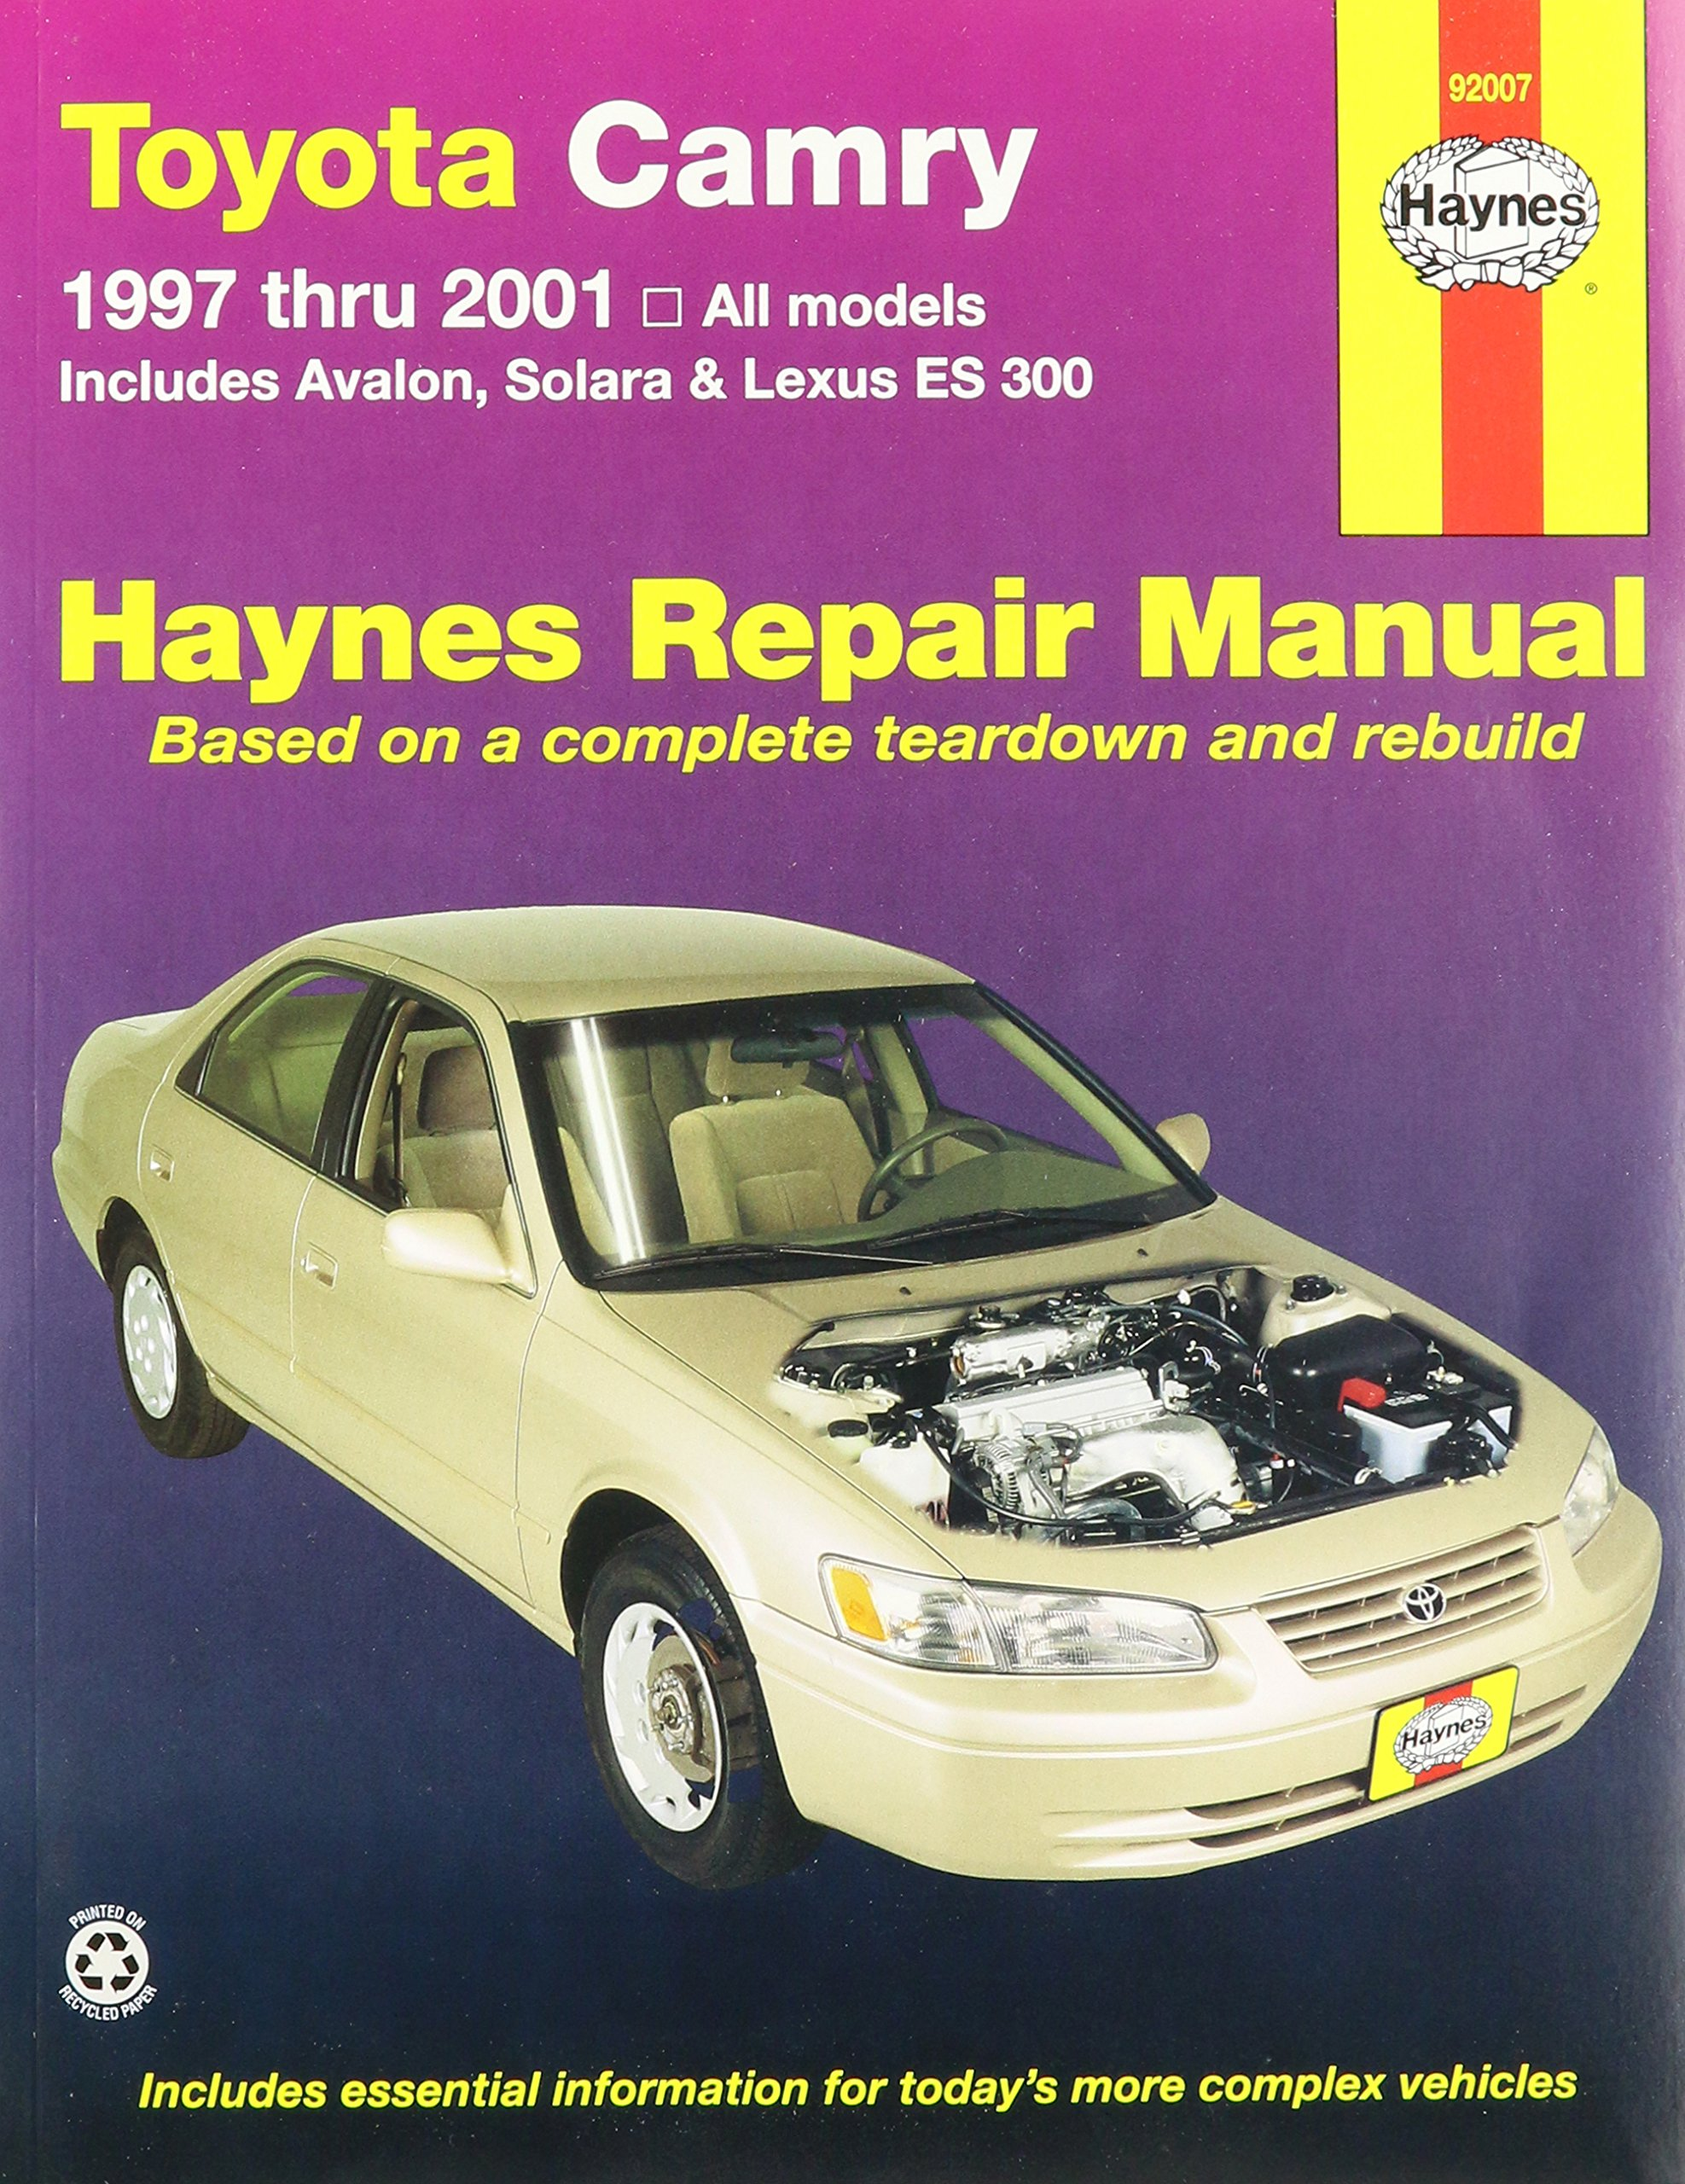 Haynes Toyota Camry (97 - 01) Manual: 5055415932311: Amazon.com: Books